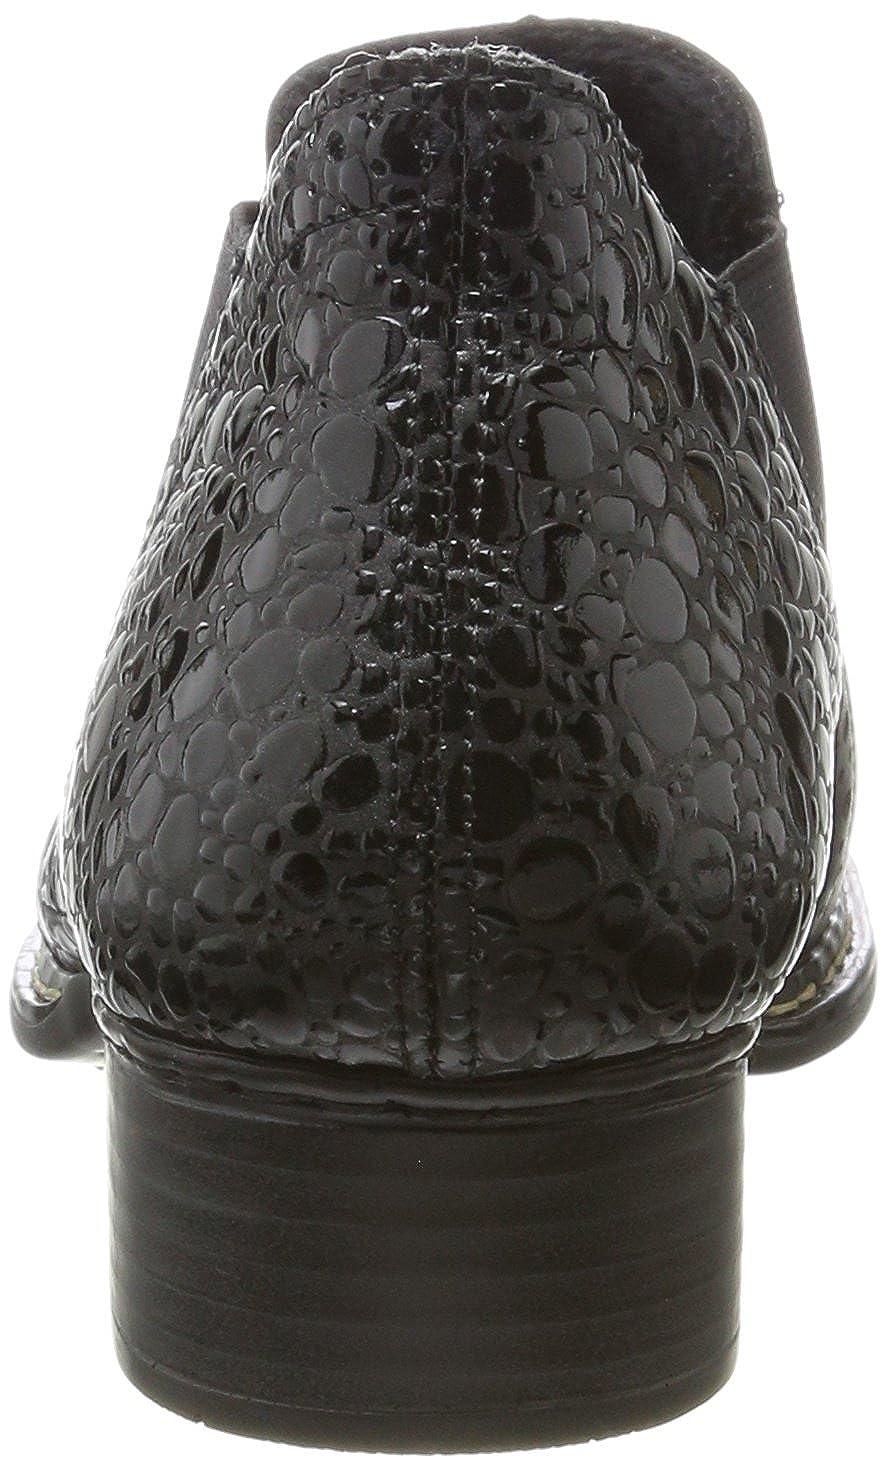 Rieker 53652 Damen 53652 Rieker Chelsea Stiefel Schwarz (Nero/Granit) 25193d